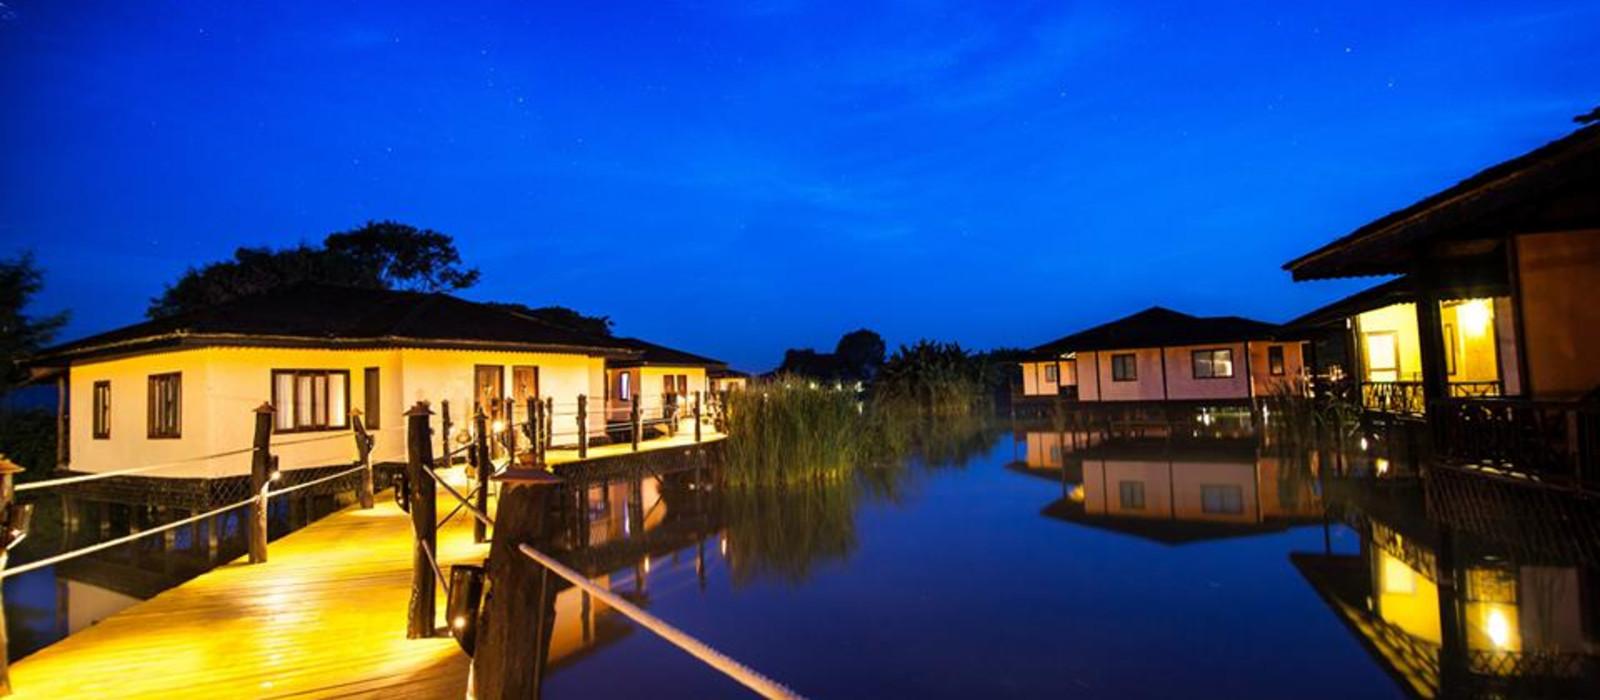 Hotel ViewPoint Lodge Myanmar